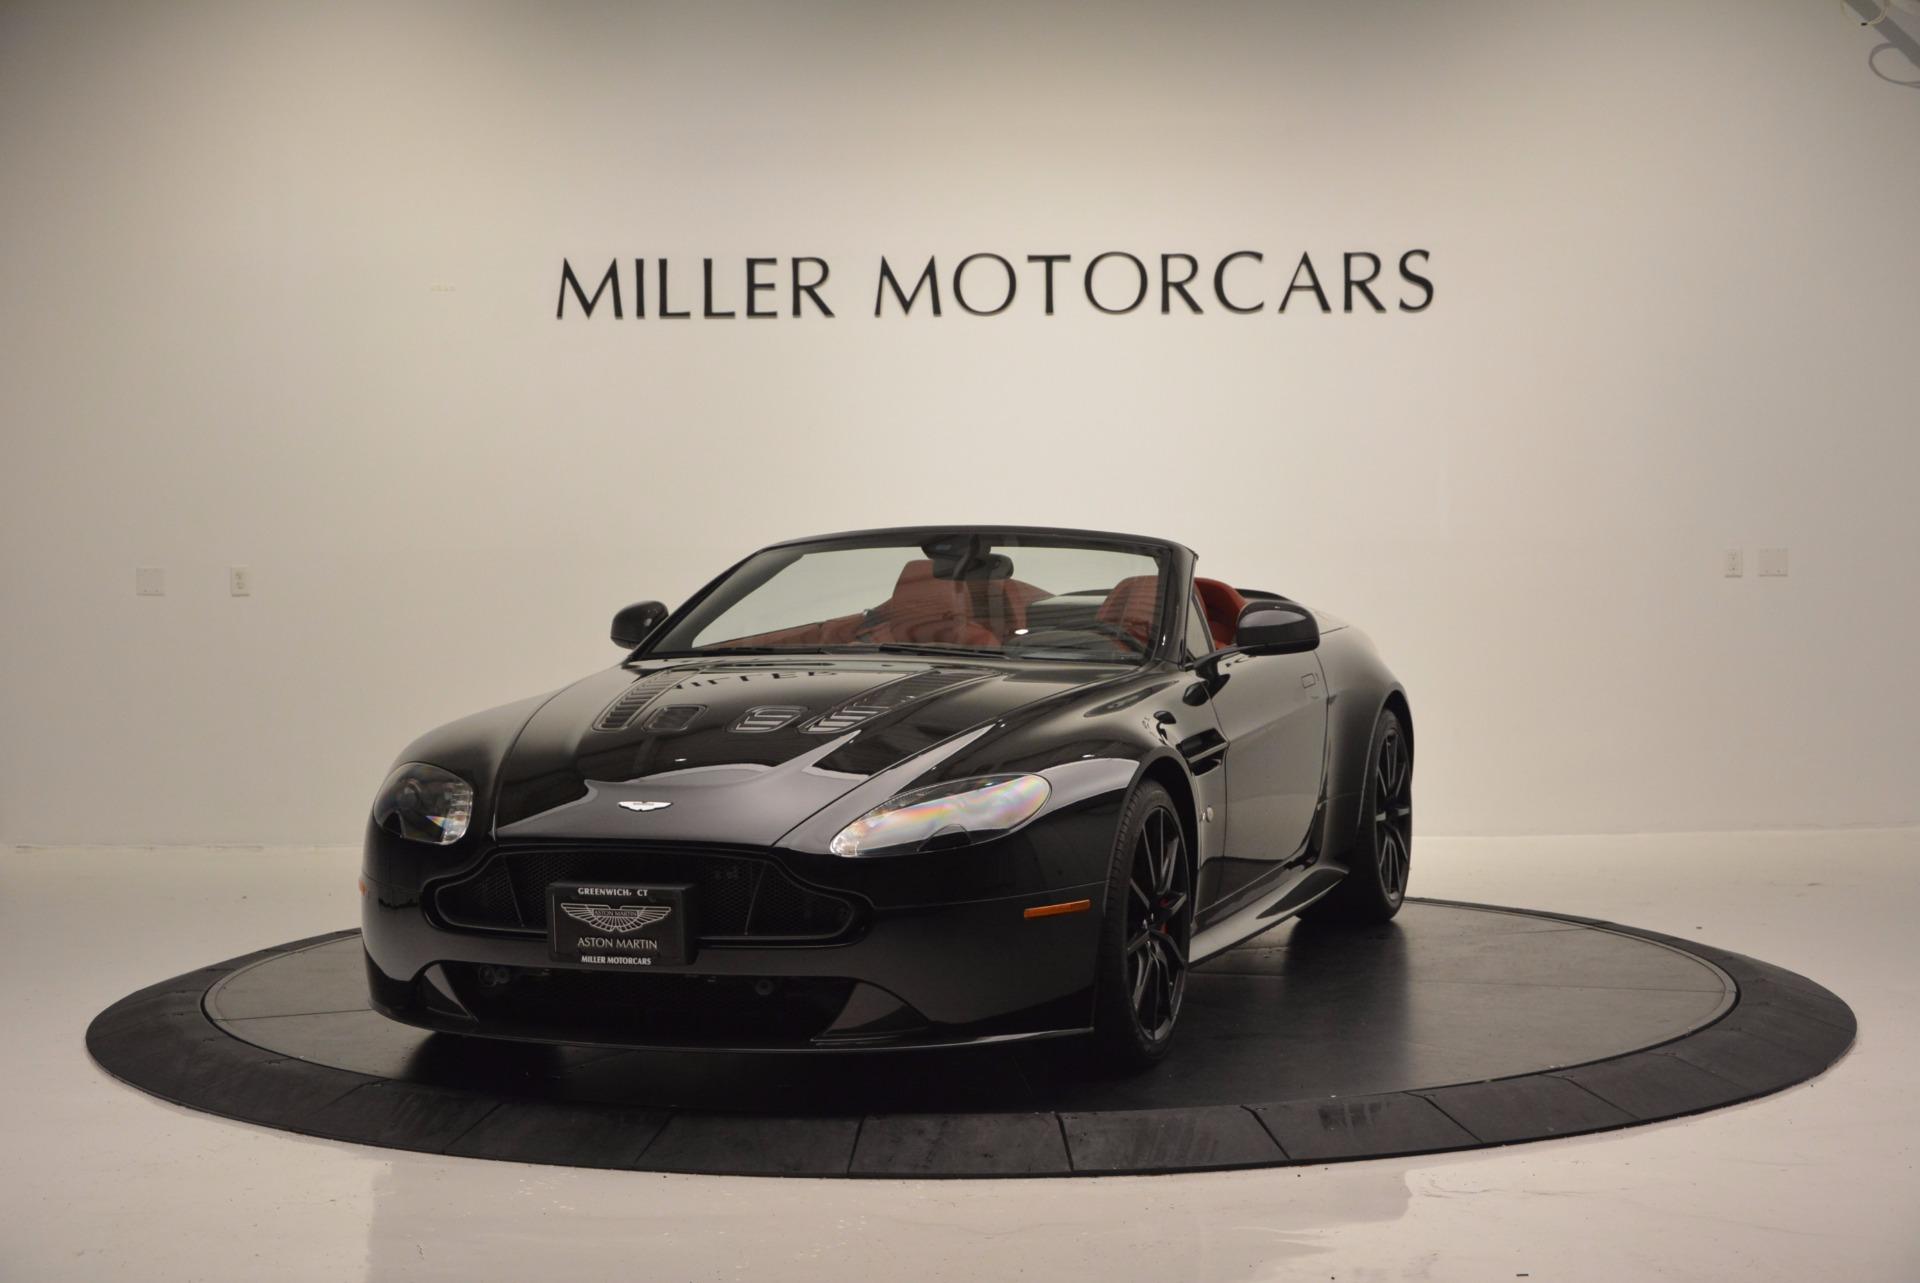 Used 2015 Aston Martin V12 Vantage S Roadster for sale Sold at Alfa Romeo of Westport in Westport CT 06880 1